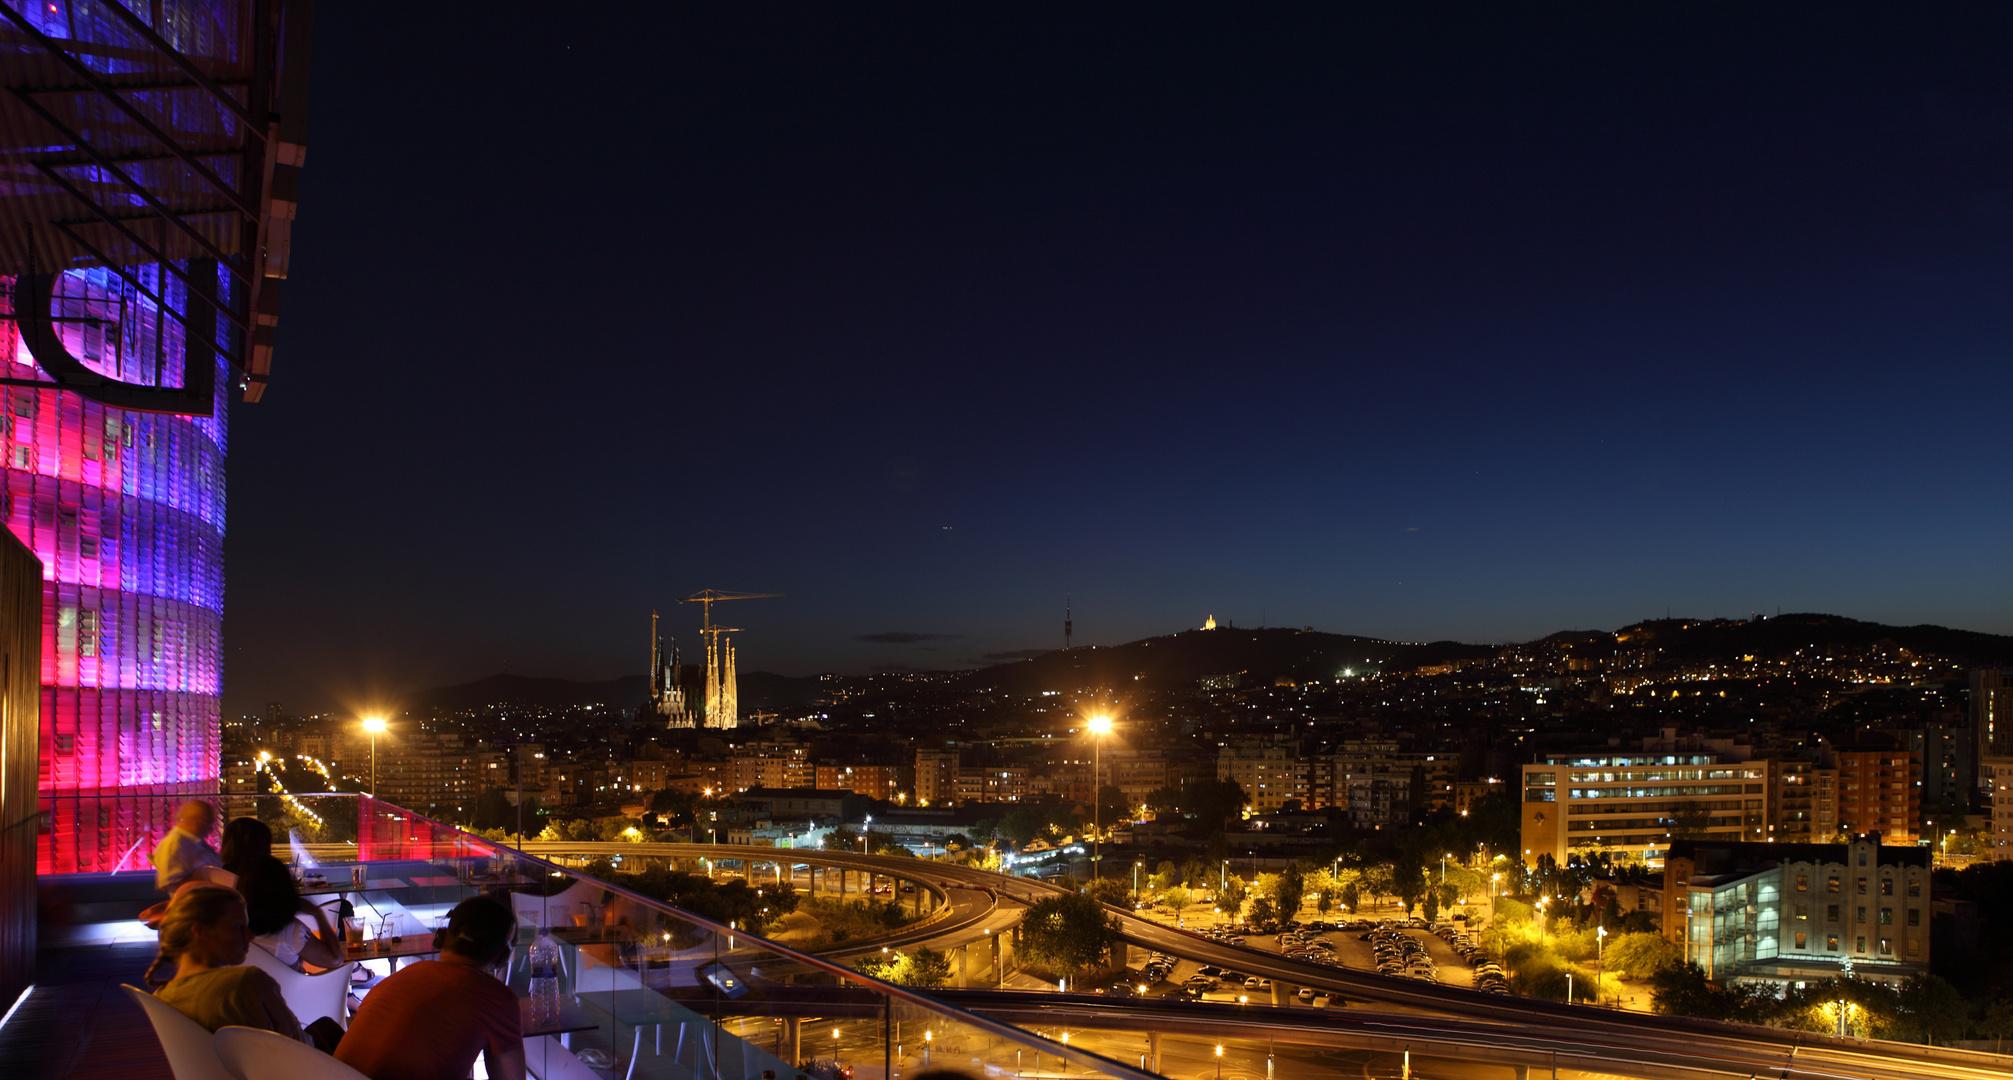 Nocturna de BCN desde l'Hotel Silke